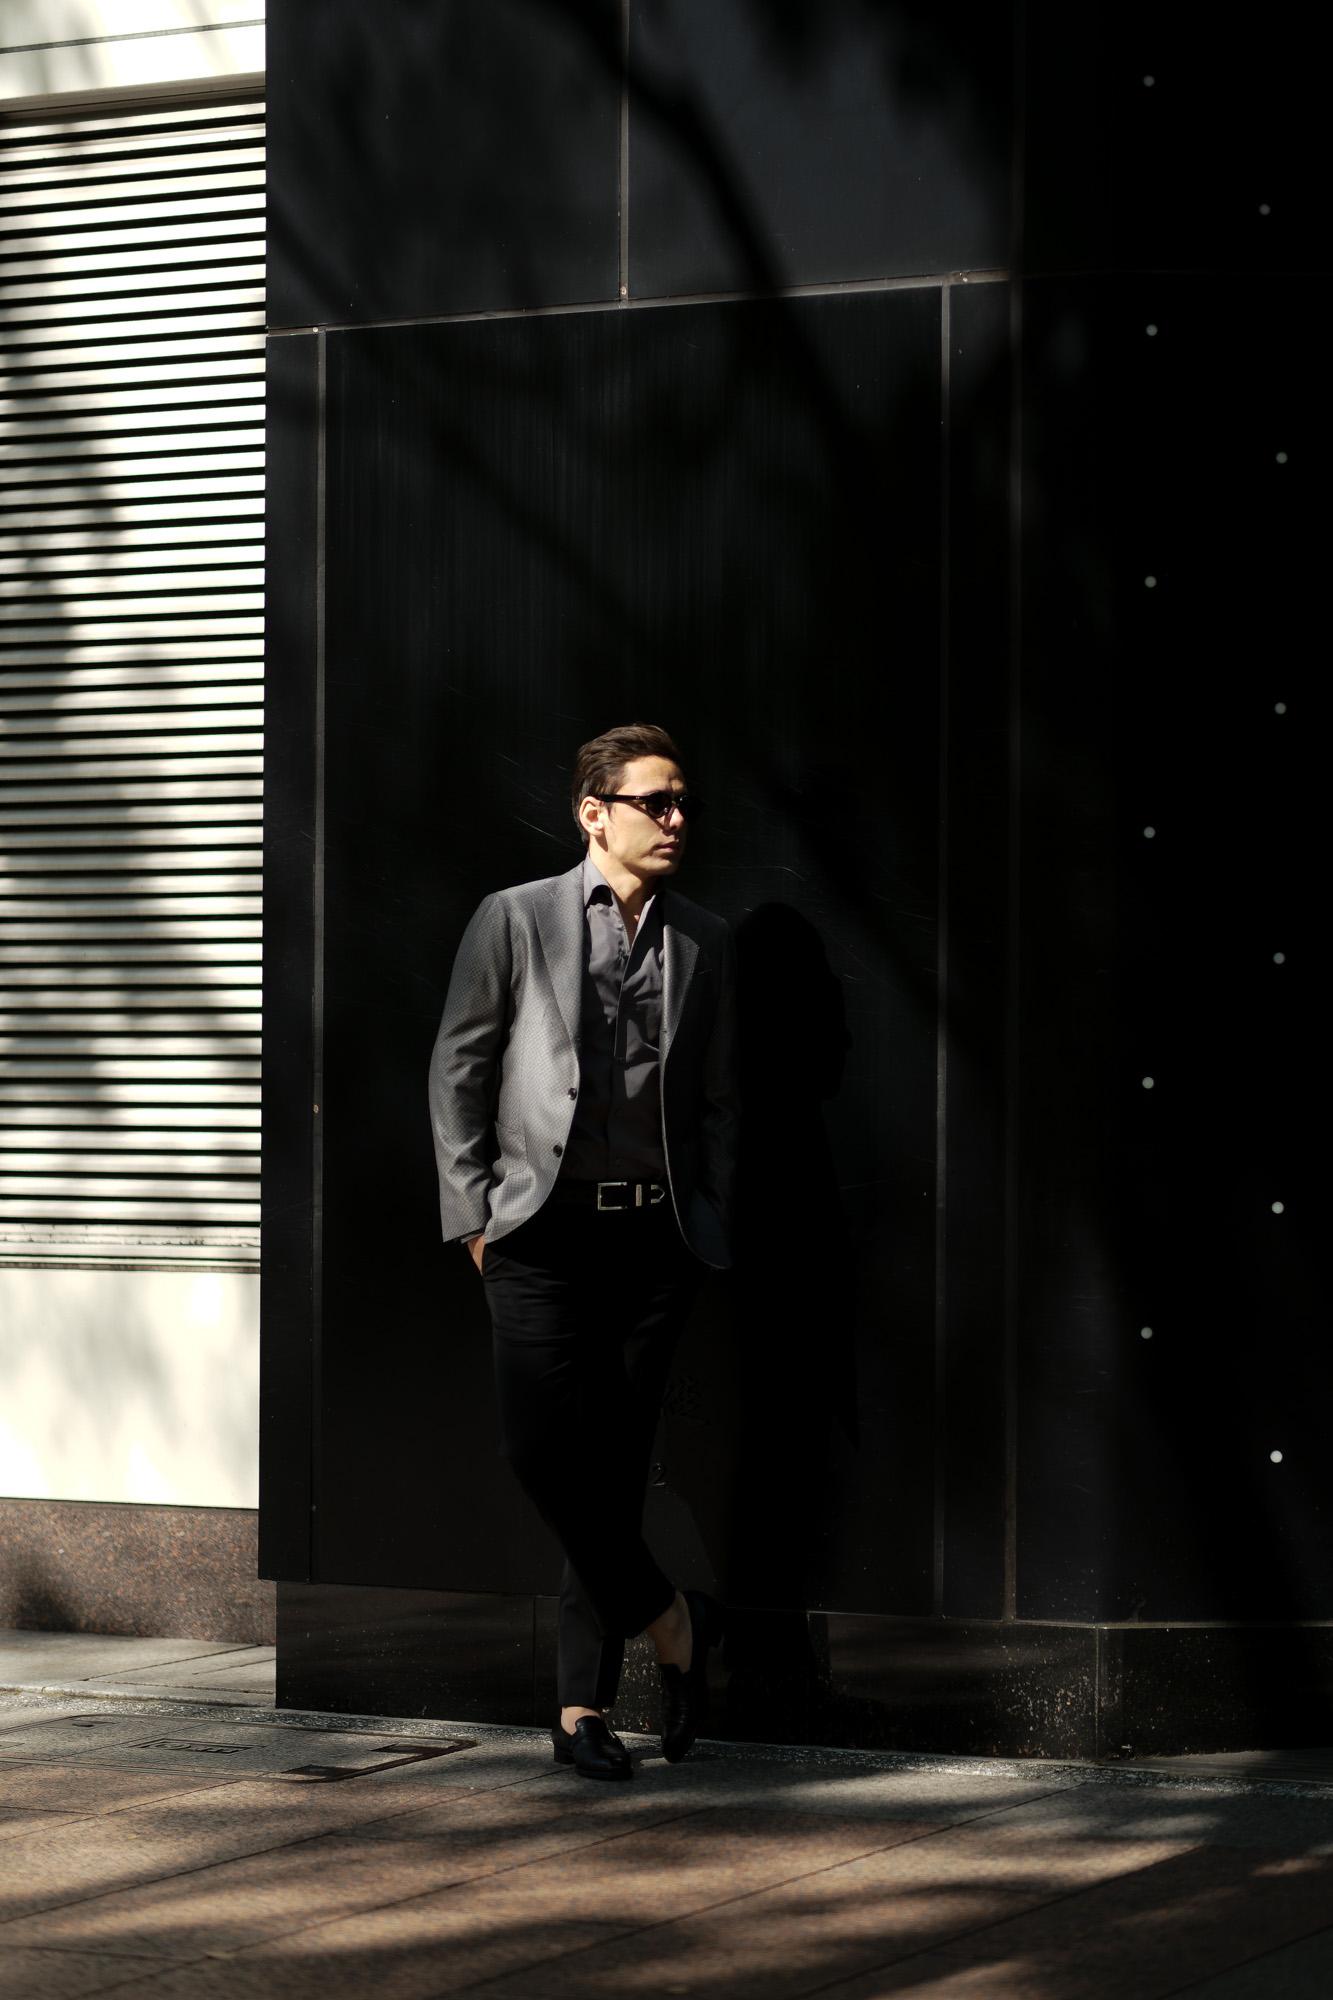 cuervo bopoha (クエルボ ヴァローナ) Sartoria Collection (サルトリア コレクション) Lobb (ロブ) Dominique France (ドミニック フランス) LORRAINE NANCY III (ロレーヌナンシー トロワ) EXCELLENT WOOL × SILK ウールシルク サマージャケット GRAY (グレー) MADE IN JAPAN (日本製) 2020 【Special Special Special Model】【ご予約受付中】ドミニックフランス ドミニクフランス ジャケット 超絶ブランド ドミニクフランス ネクタイ 高級 フランス 愛知 名古屋 altoediritto アルトエデリット